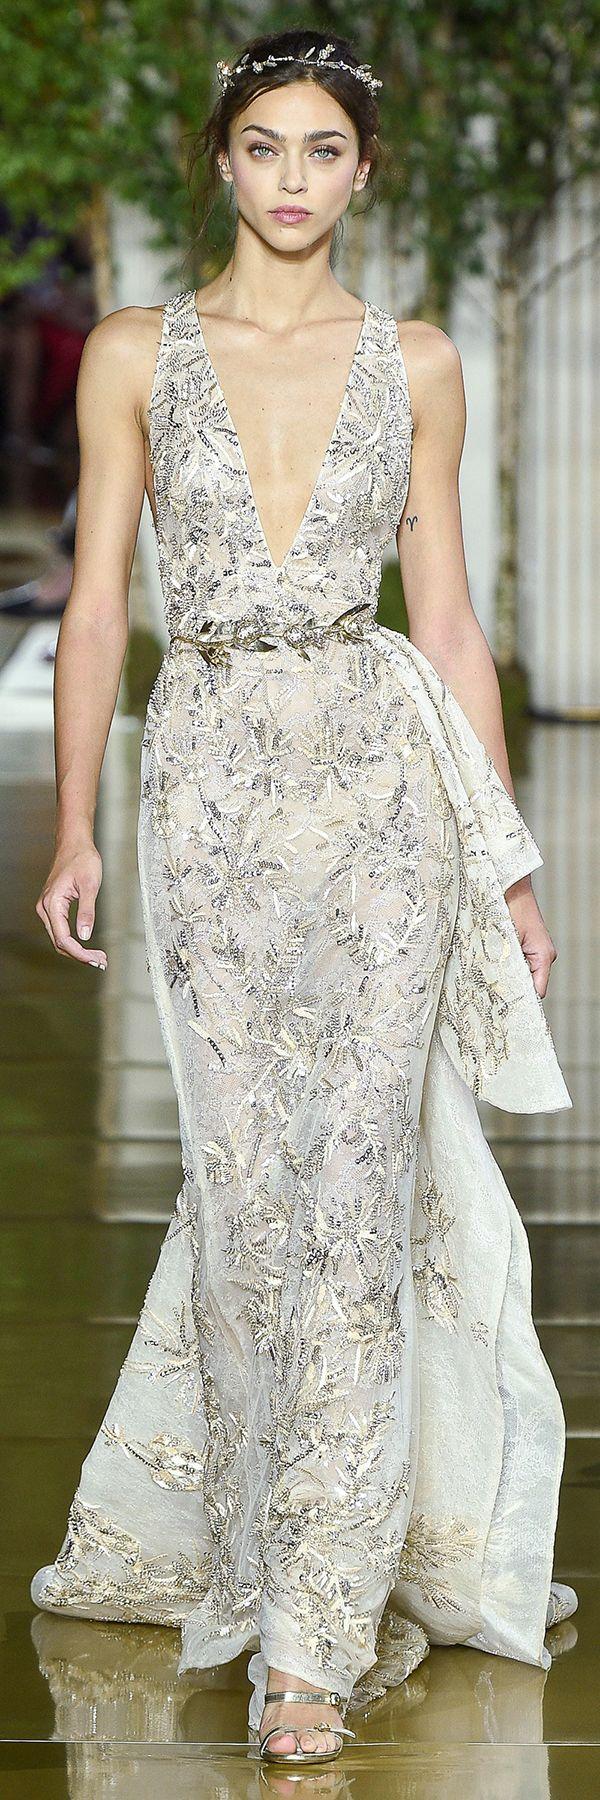 Wedding dresses crewe   best Wedding dresses images on Pinterest  Homecoming dresses